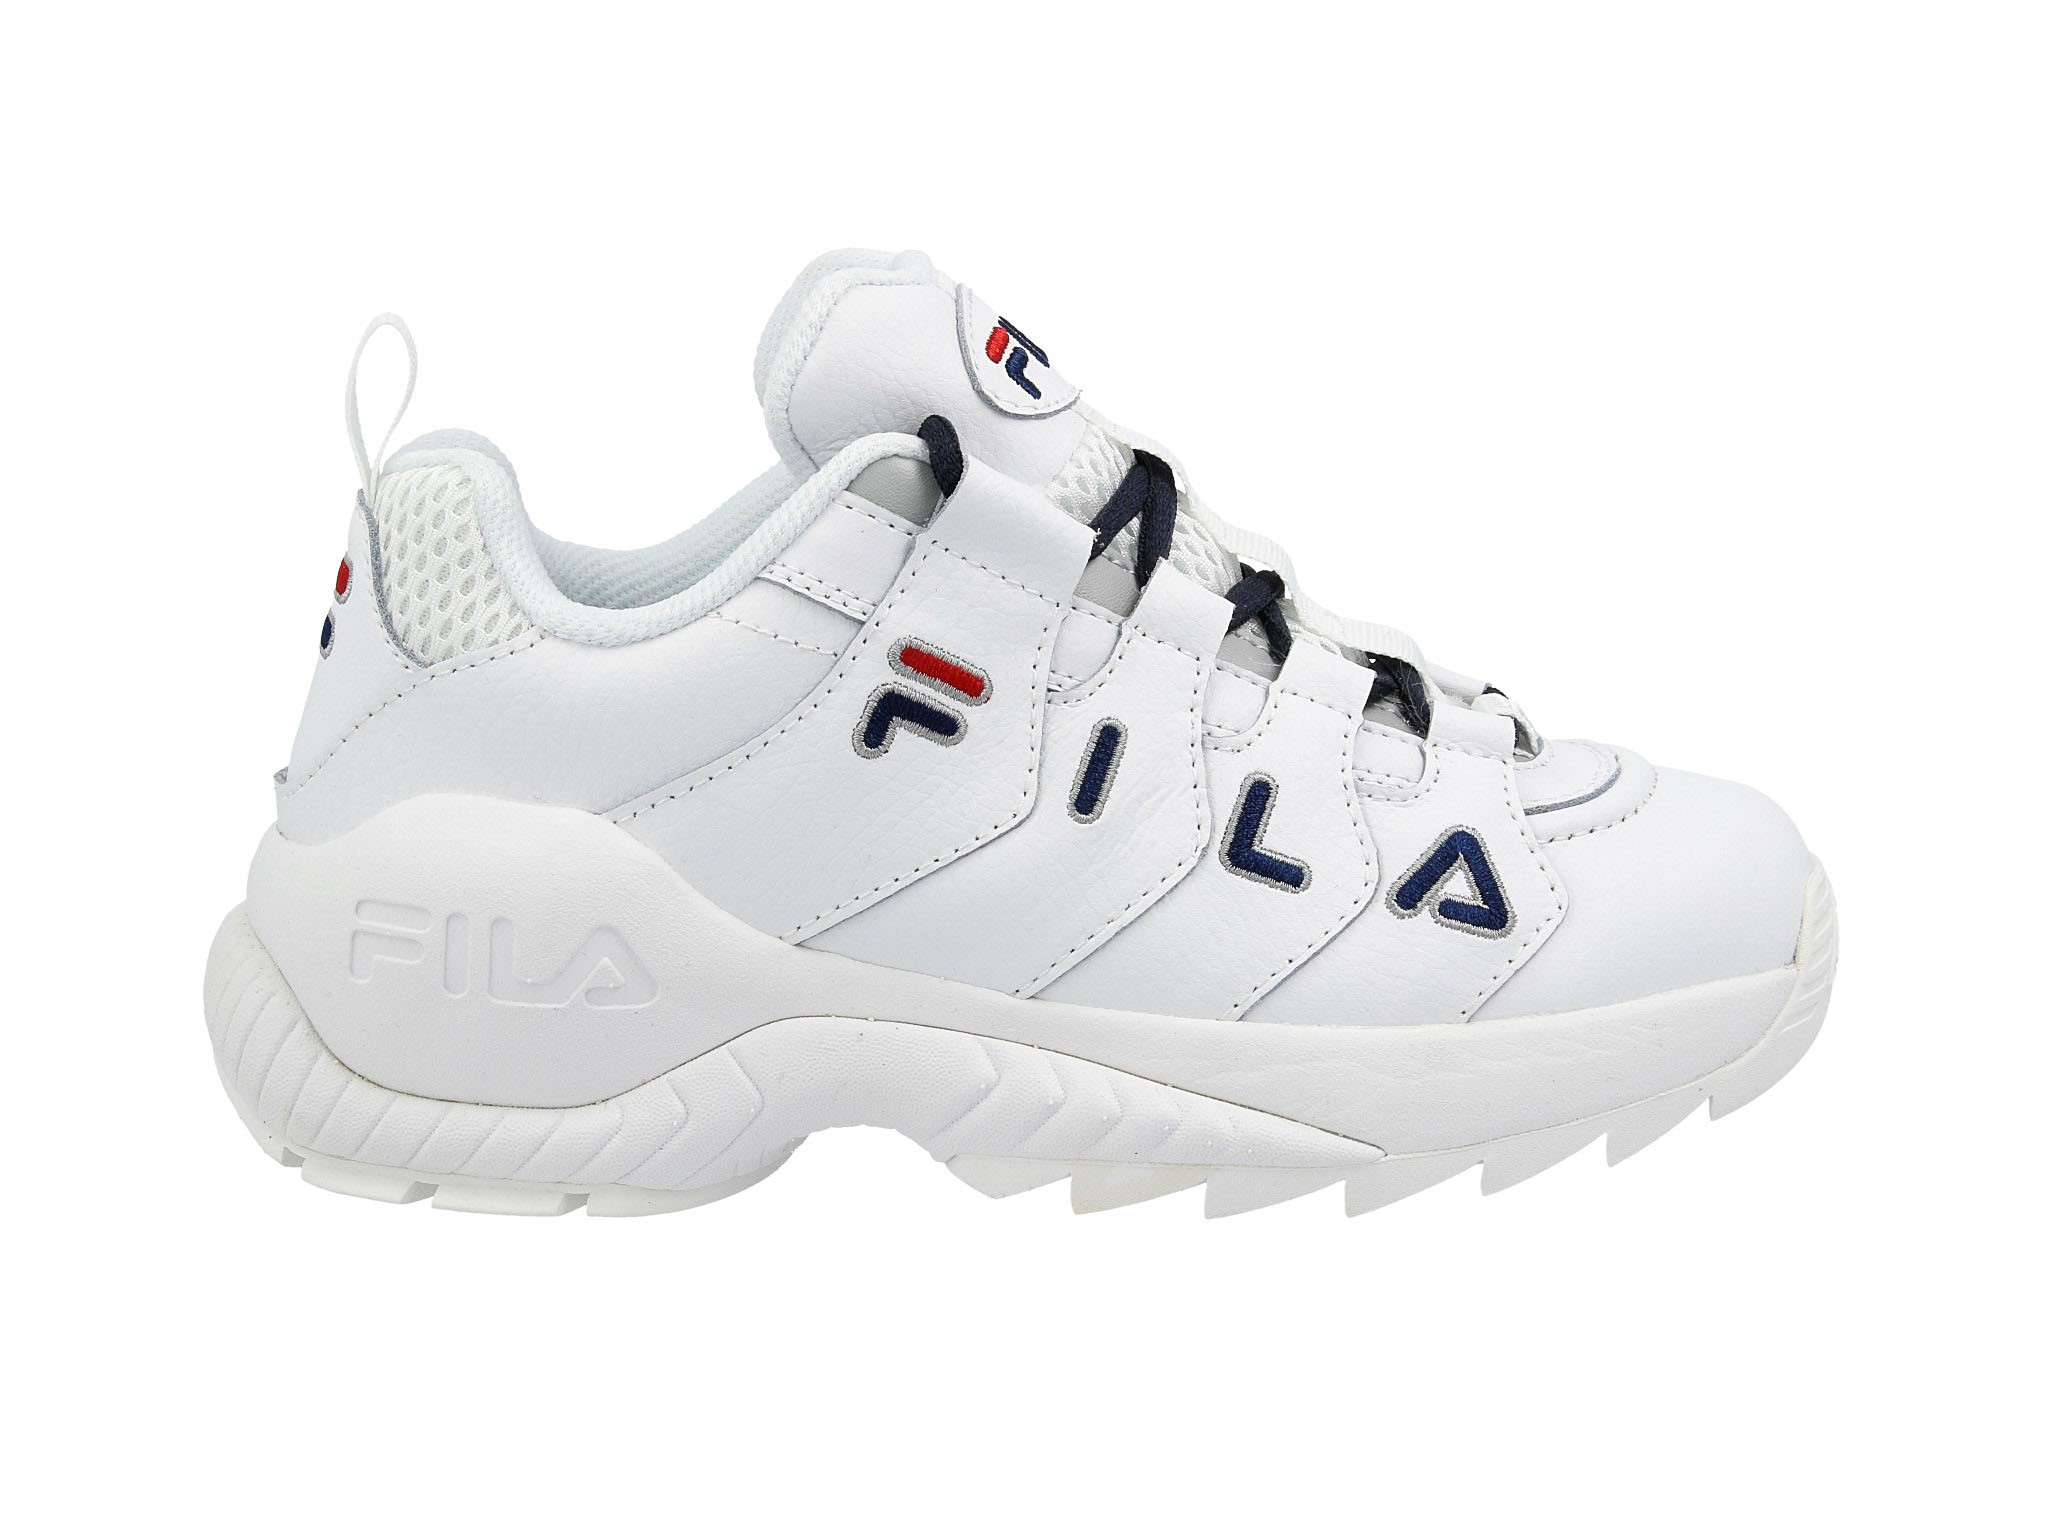 Buty damskie Sneakers Fila Countdown Low WMN white (1010751.1FG)